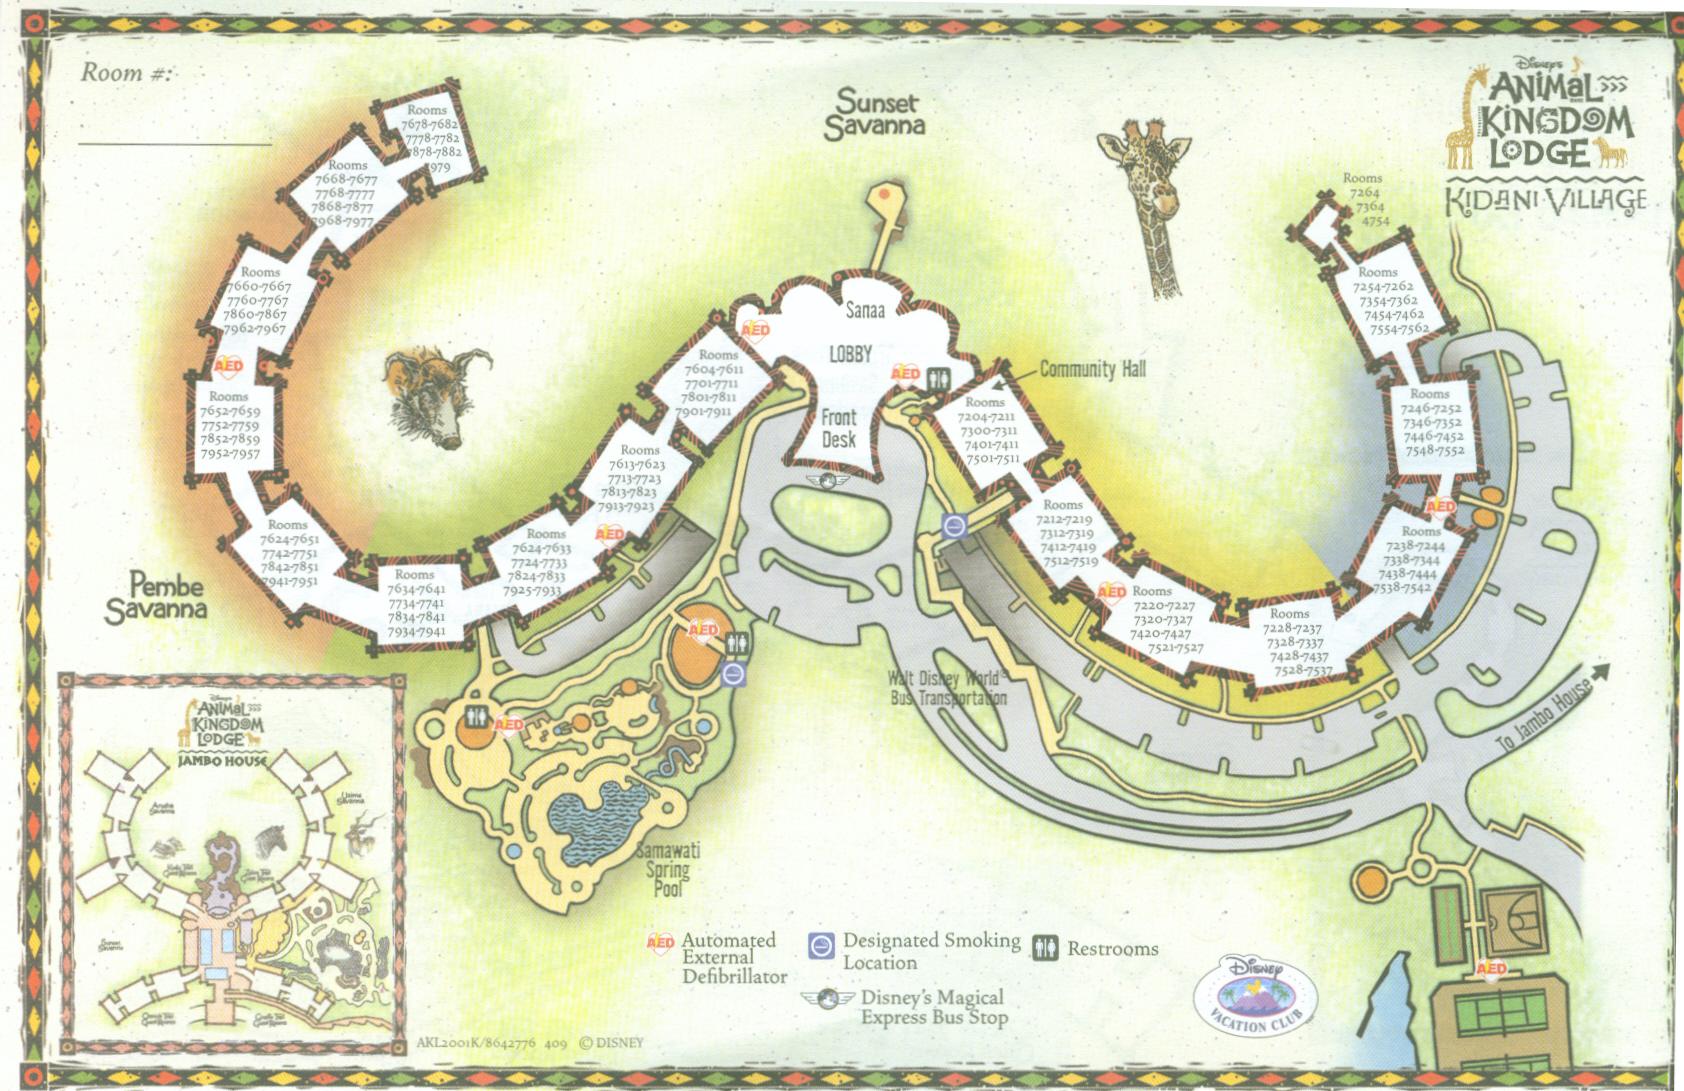 Hotel Room Layout Animal Kingdom Lodge Villas At Walt Disney World Resort